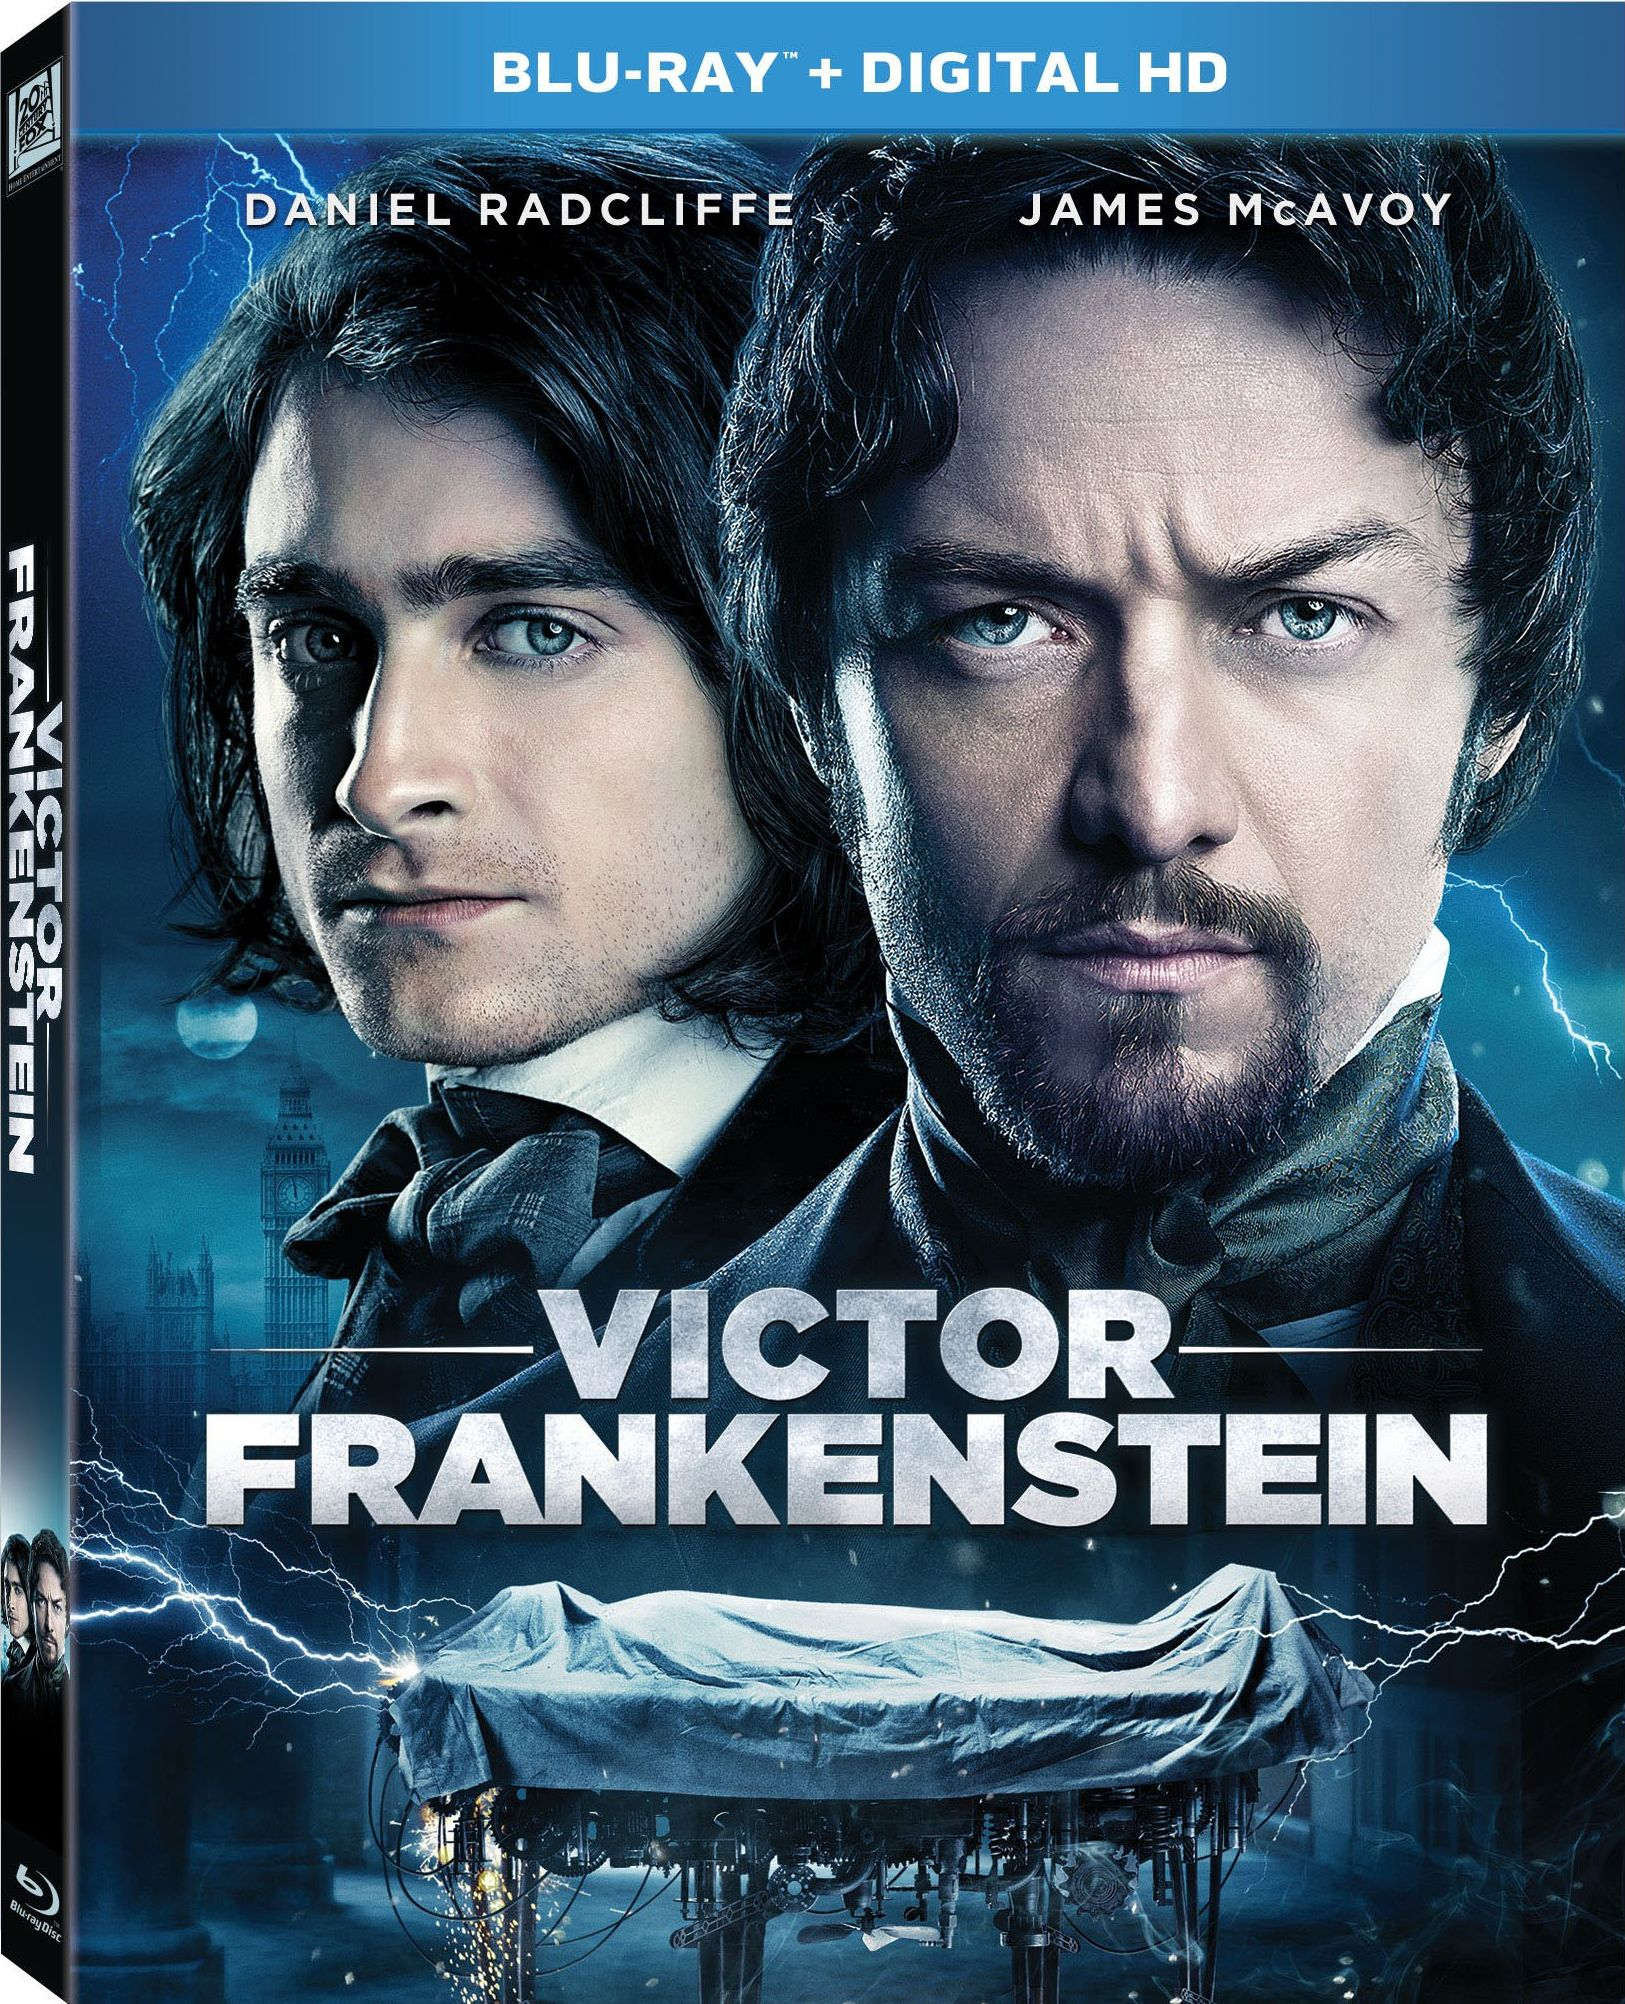 Victor Frankenstein #6